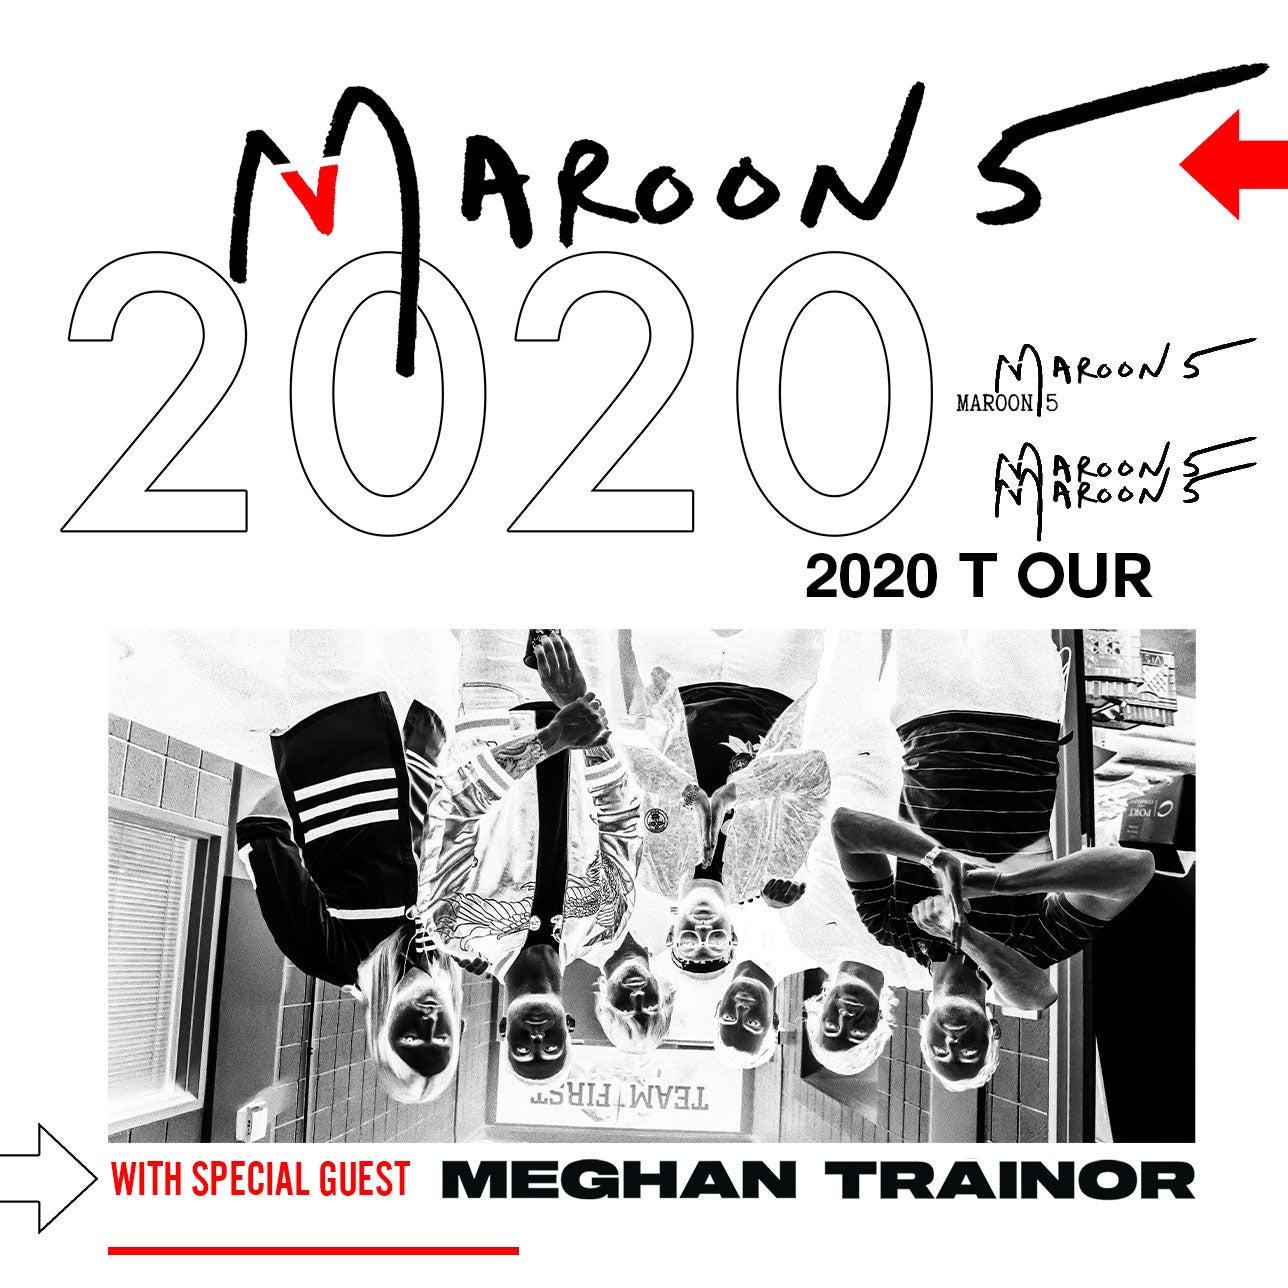 Maroon 5 - Rescheduled to Aug. 7, 2021